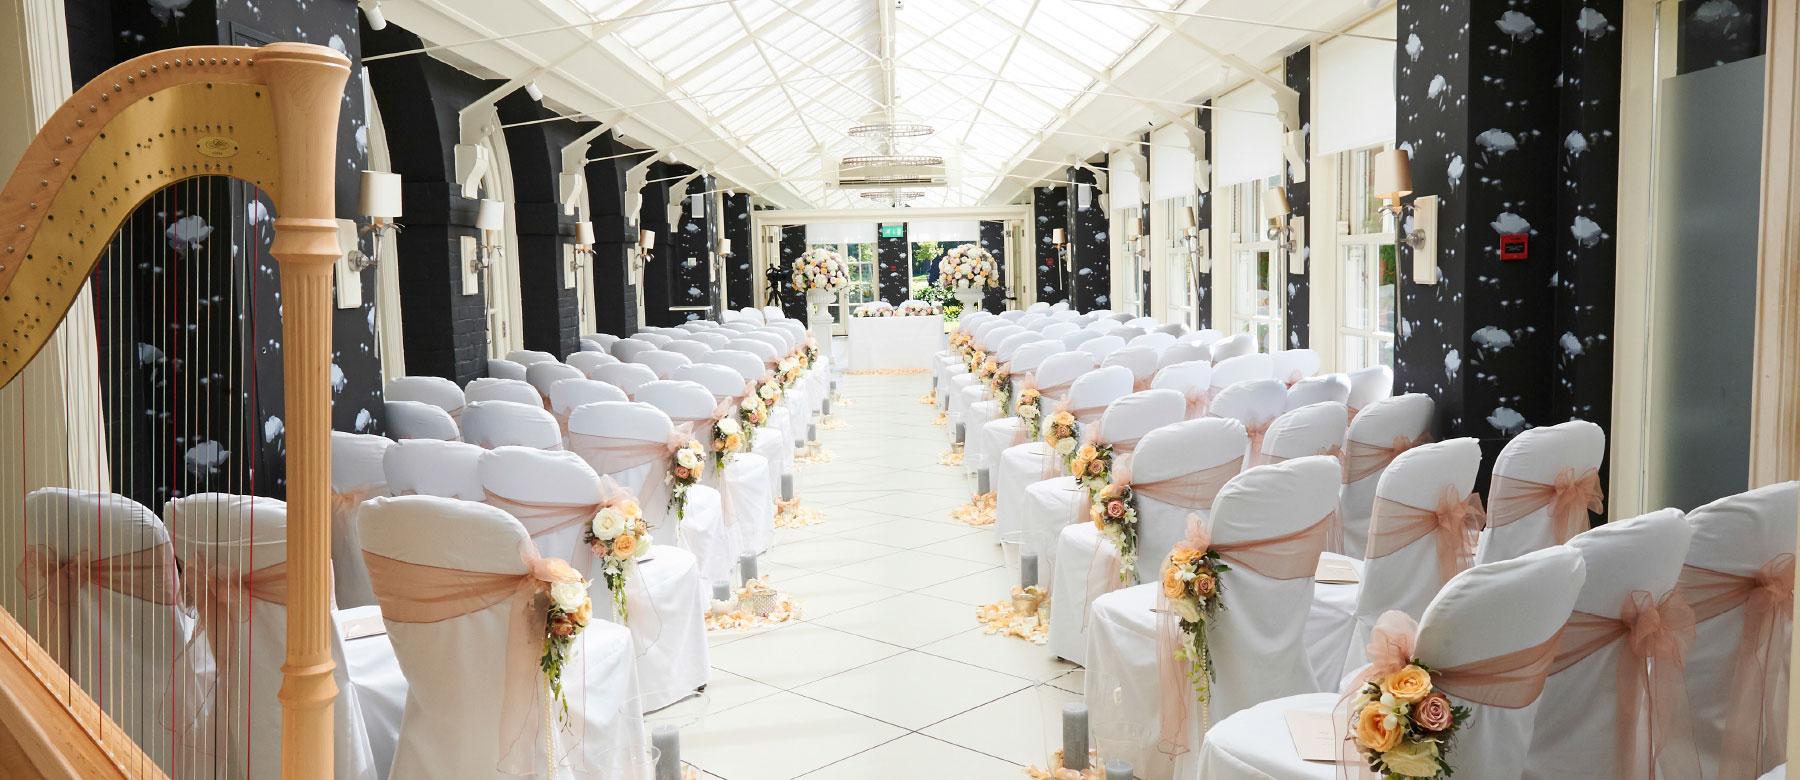 full wedding planning wedding venue